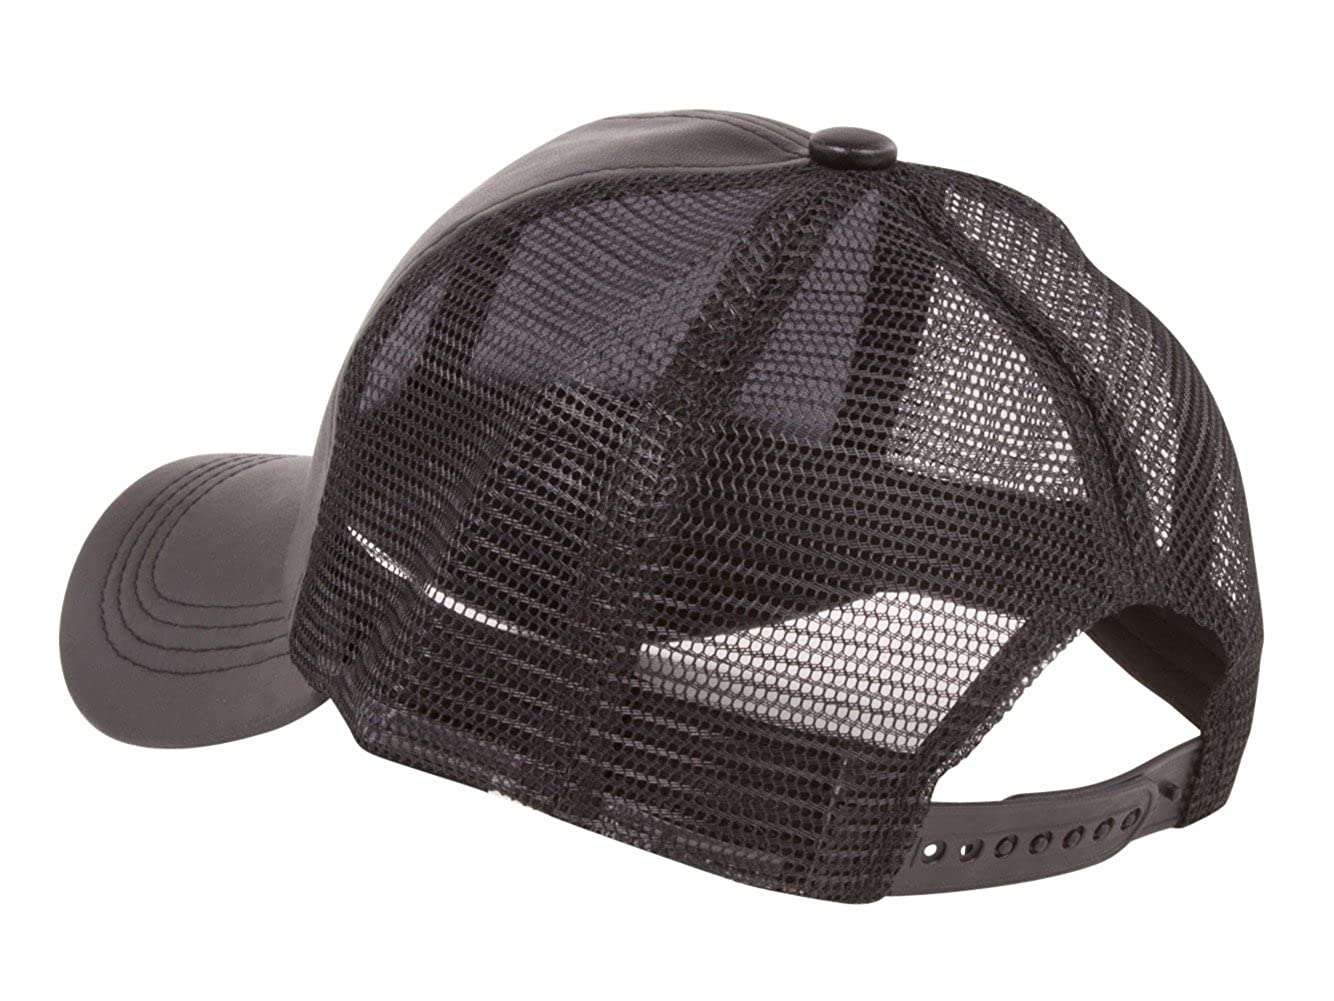 e843bc77 TOP HEADWEAR PU Leather Mesh Trucker Adjustable Snapback Hat - Black at  Amazon Men's Clothing store: